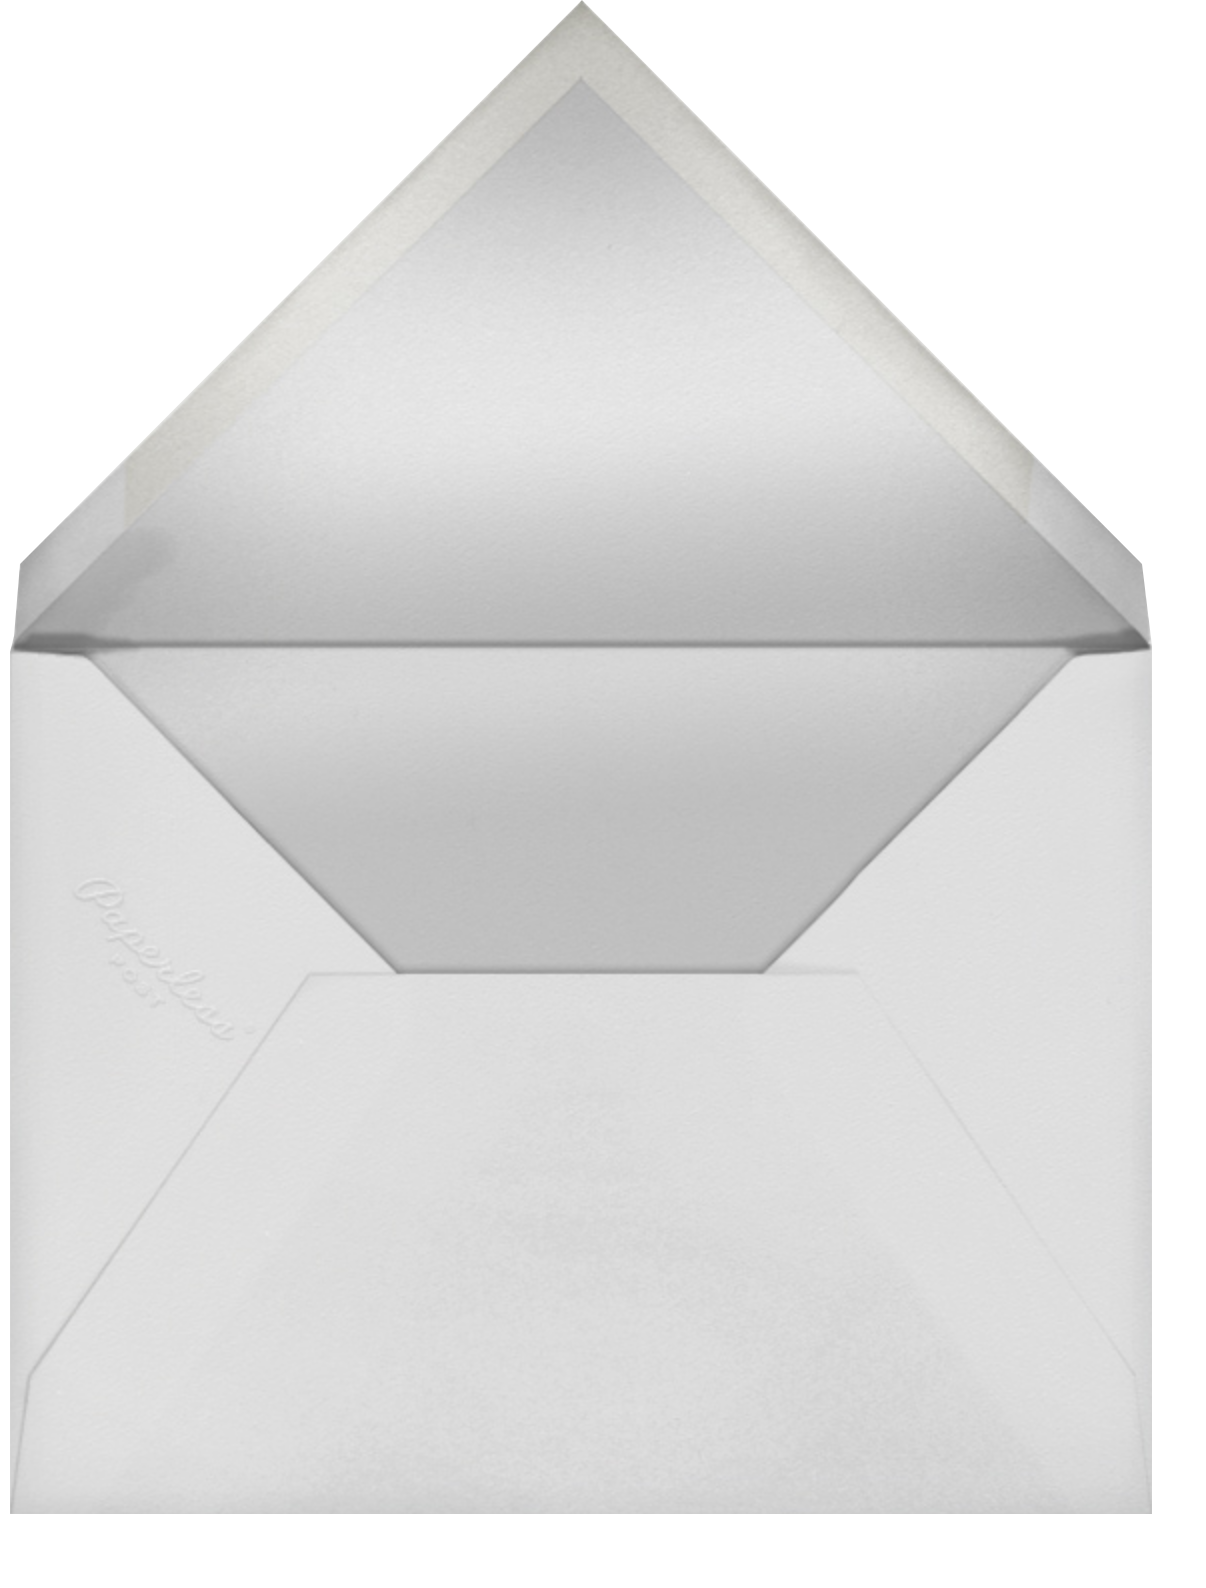 Miss Lila (Program) - Lapis - Mr. Boddington's Studio - Menus and programs - envelope back